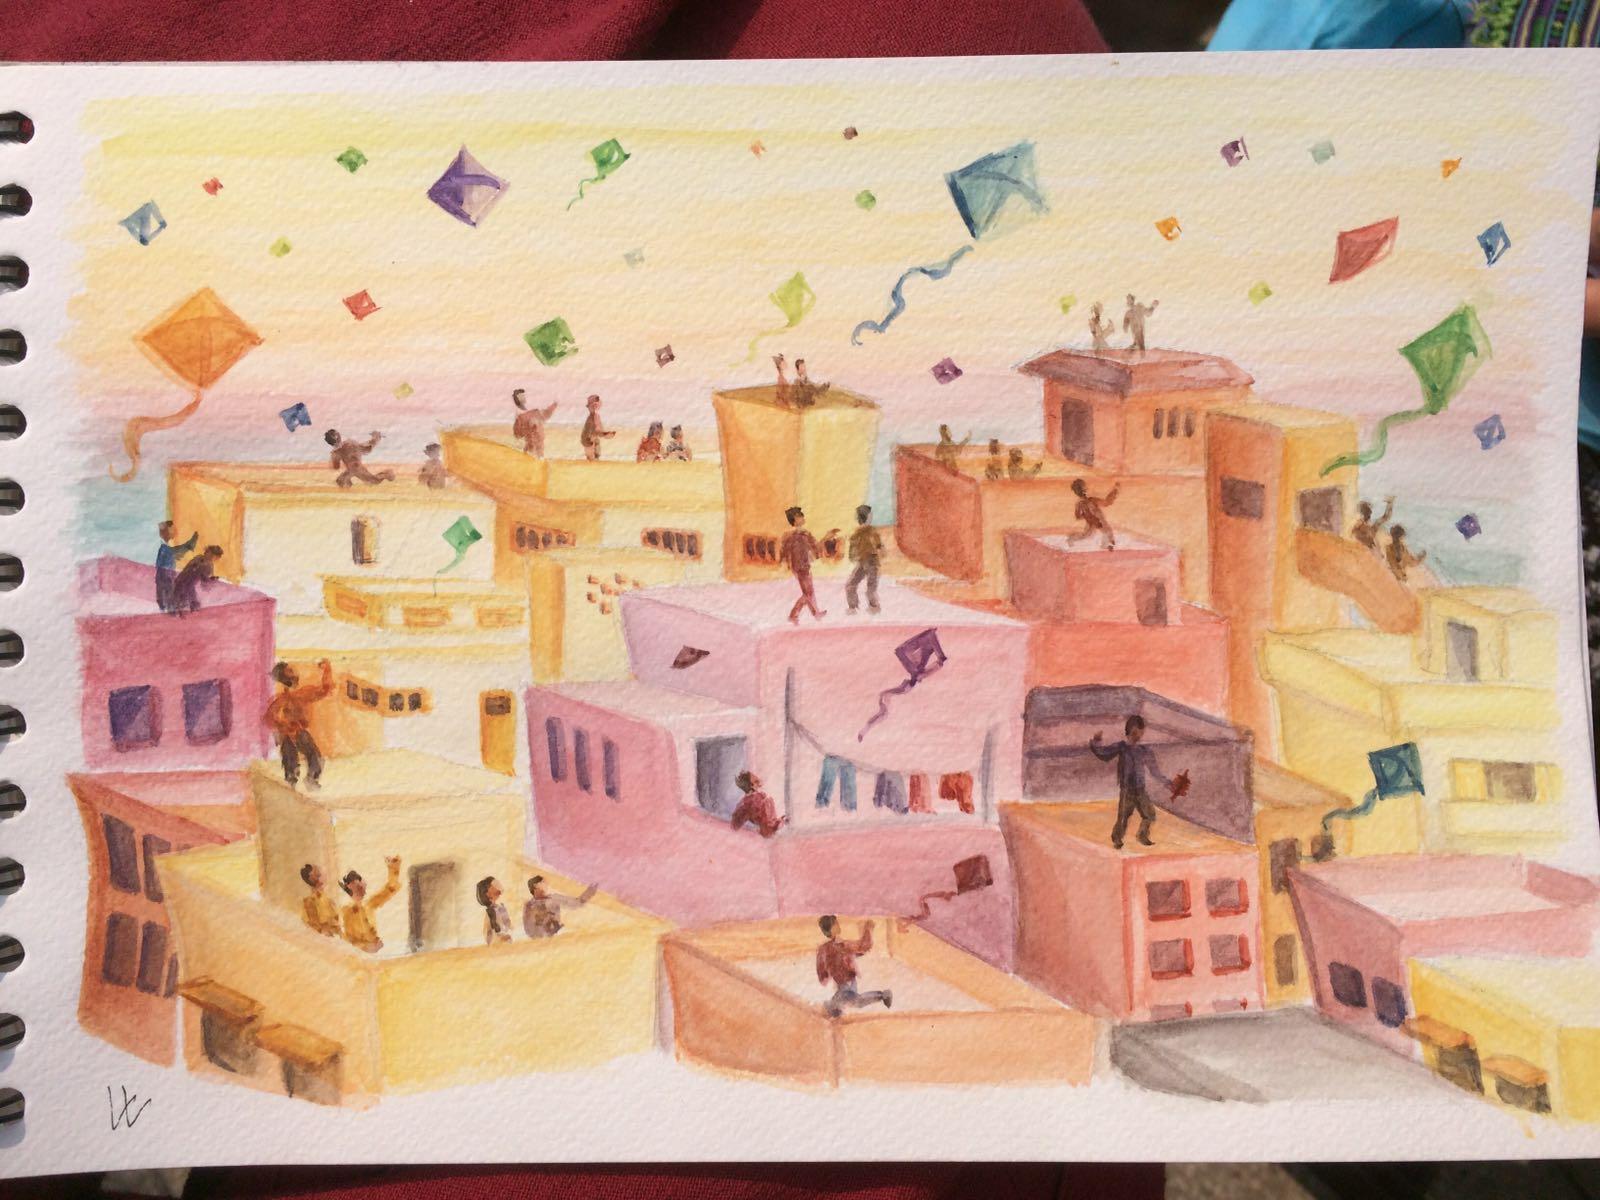 Kitefestival Gujarat India - watercolor